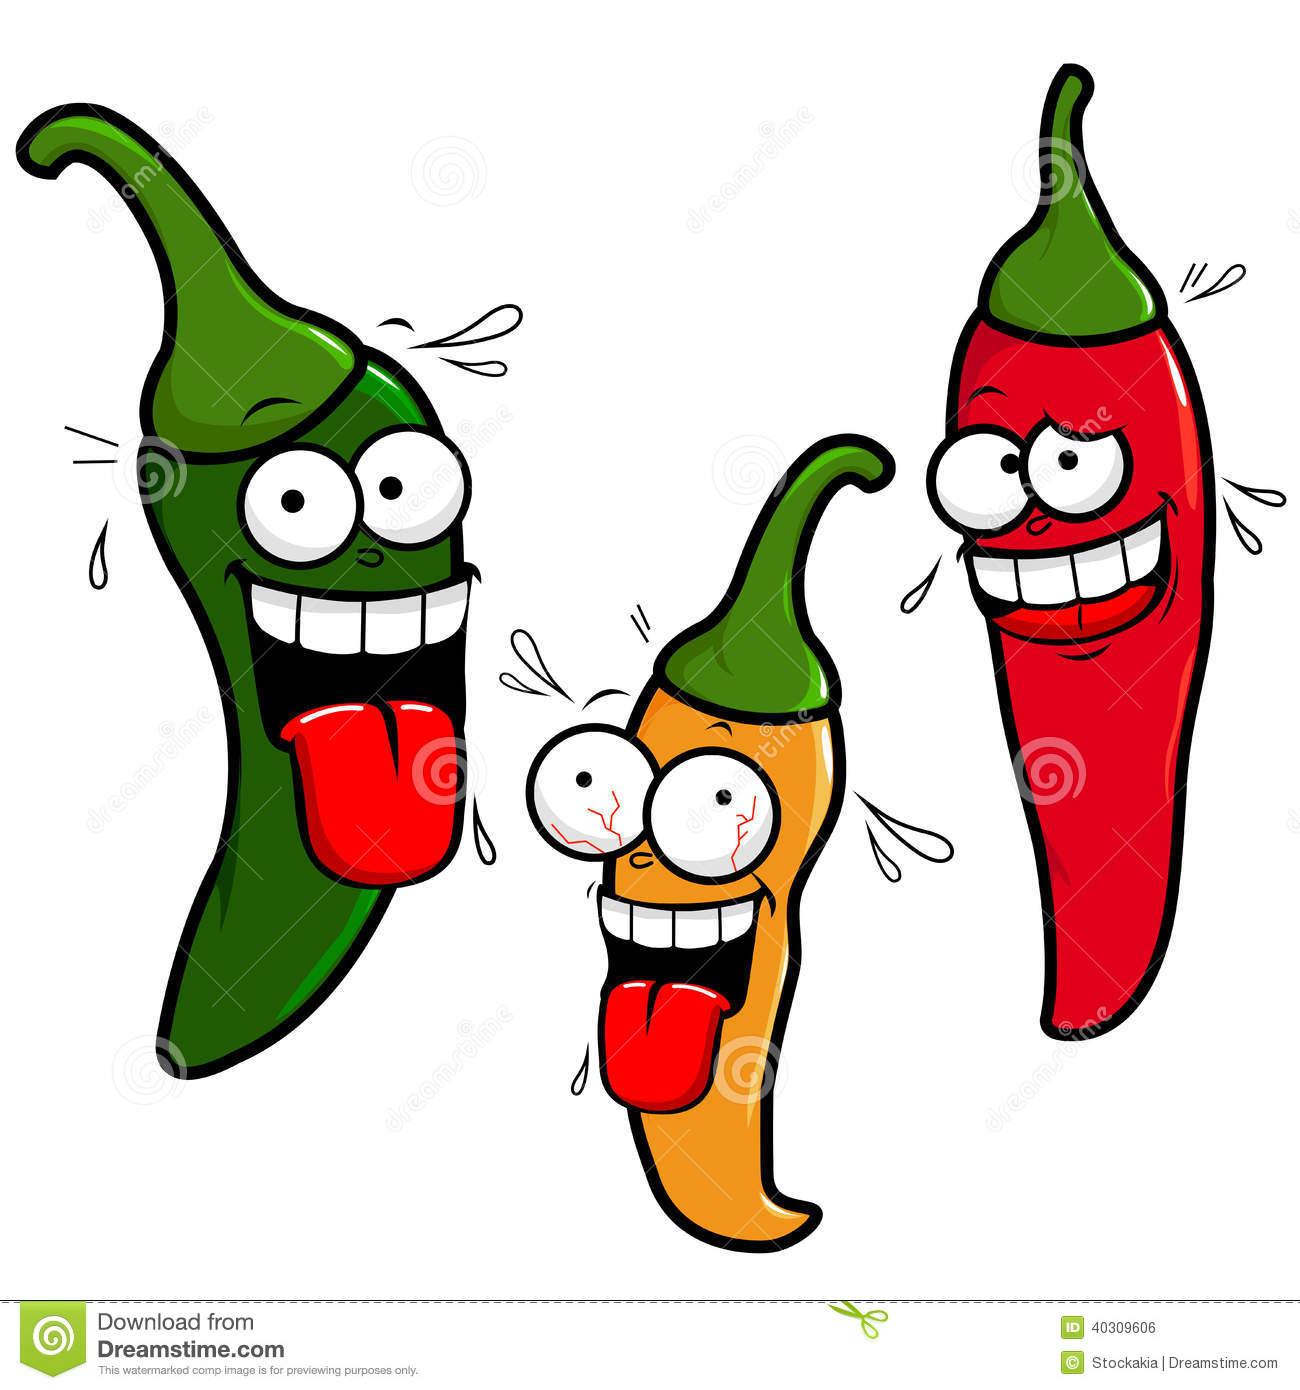 Animated chili pepper clipart.